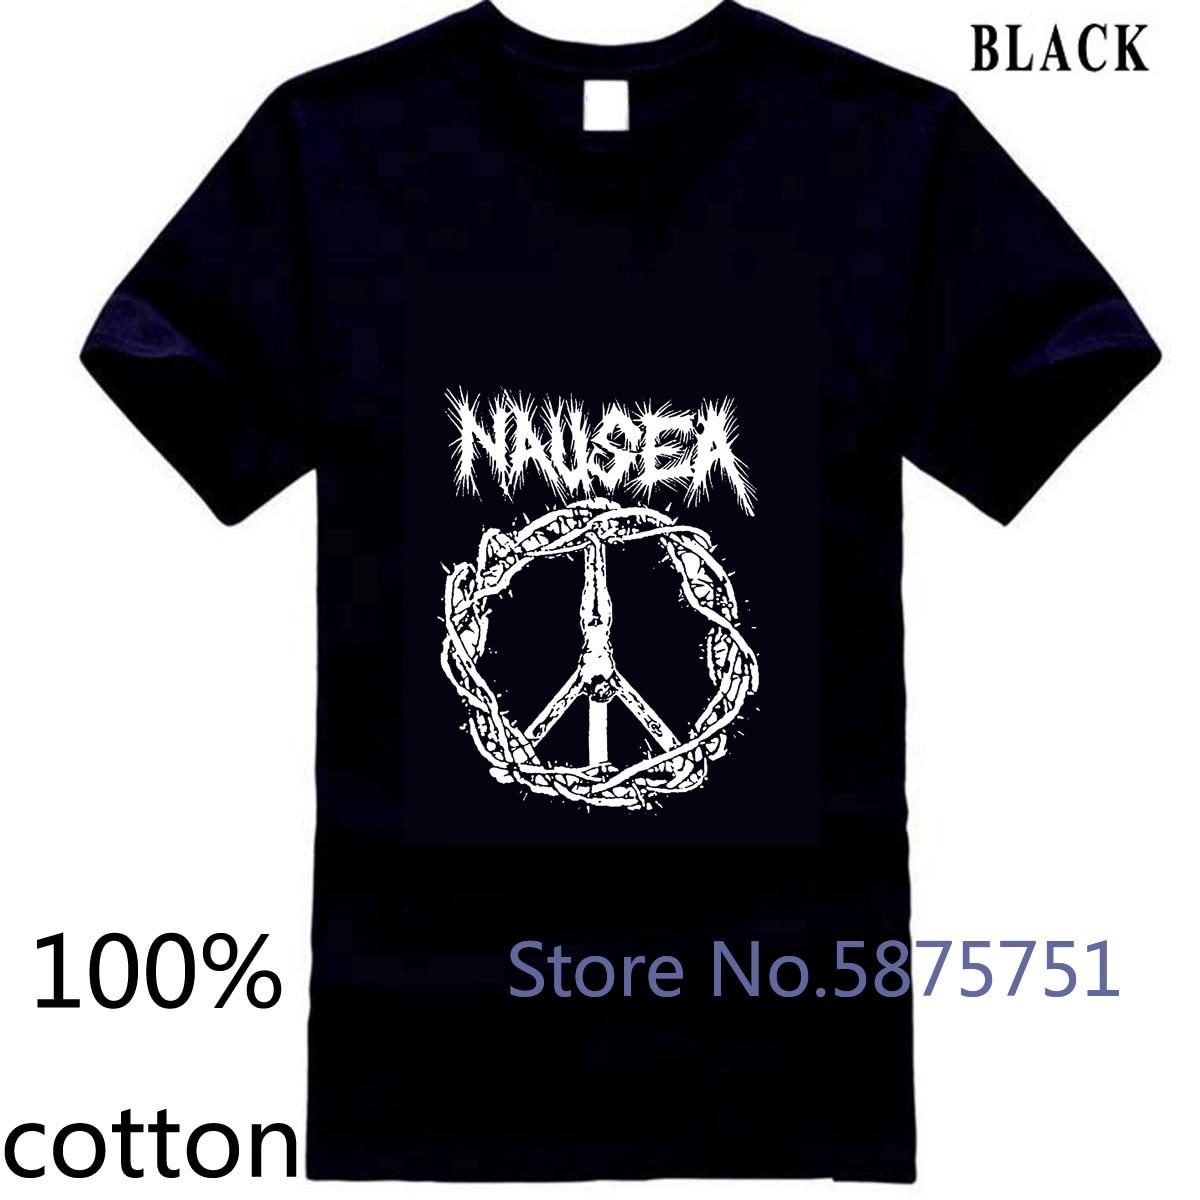 Nausea NYC Crust Punk Band icónico Jesus on A Cross Logo negro hombre Camiseta camiseta tops camisetas 100% algodón Hombre